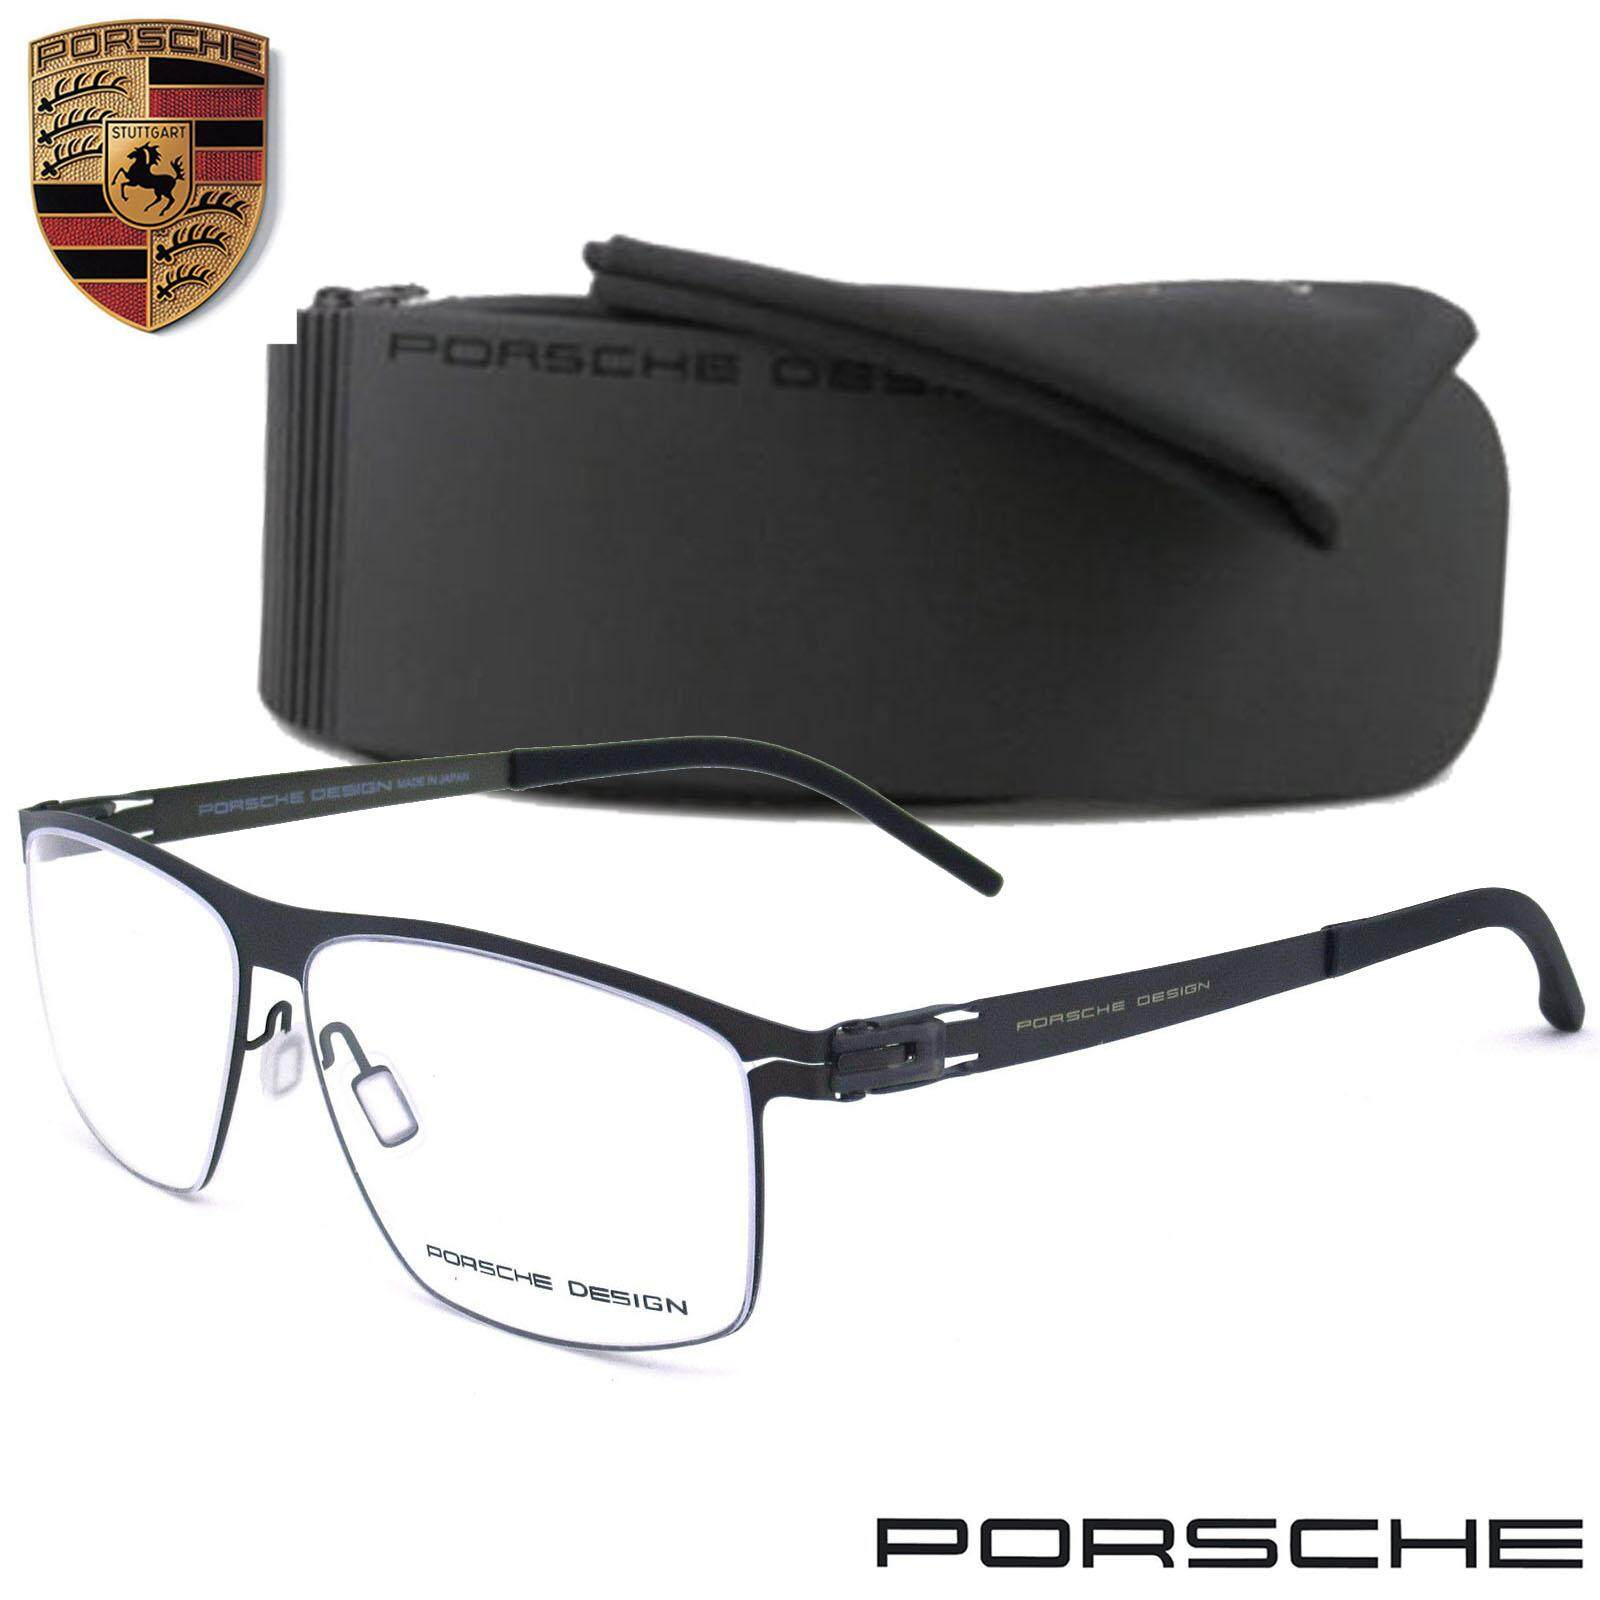 Porsche Design แว่นตา รุ่น 1081 ทรงสปอร์ต วัสดุ สแตนเลสสตีล หรือเหล็กกล้าไร้สนิม Stainless Steel ขาข้อต่อ กรอบแว่นตา ใน กรุงเทพมหานคร